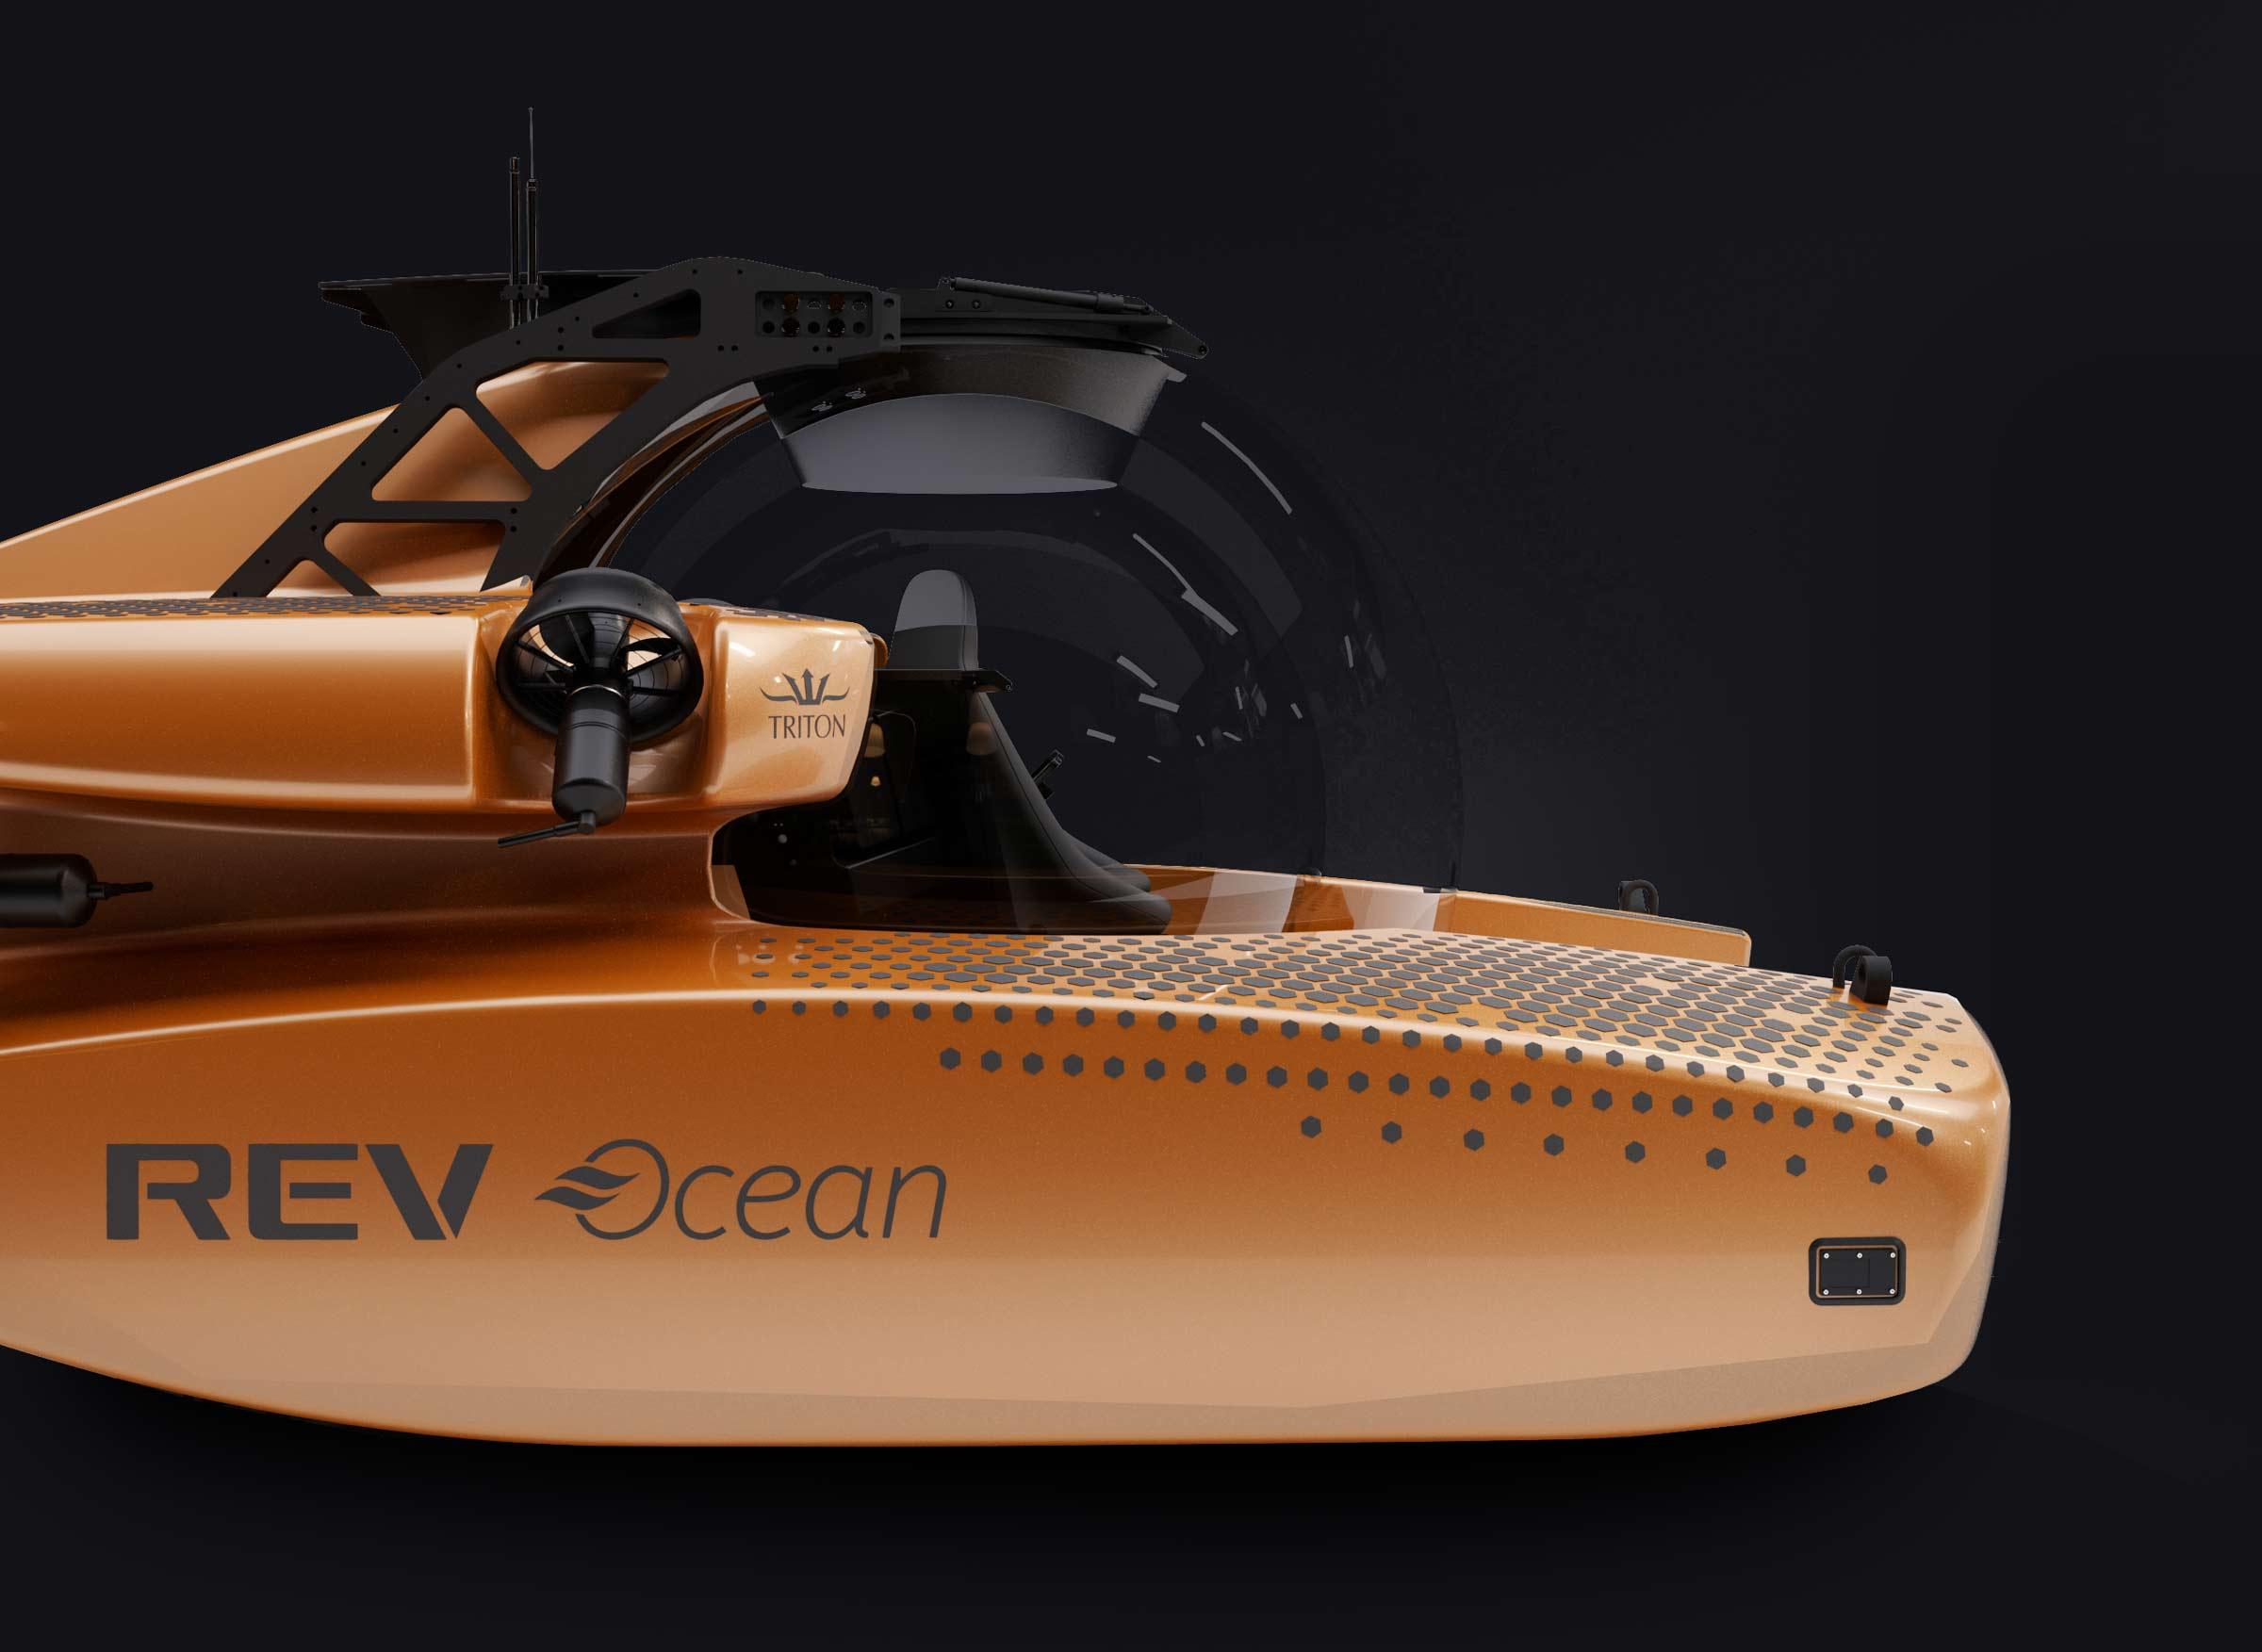 Triton 75000/3 in REV Ocean livery